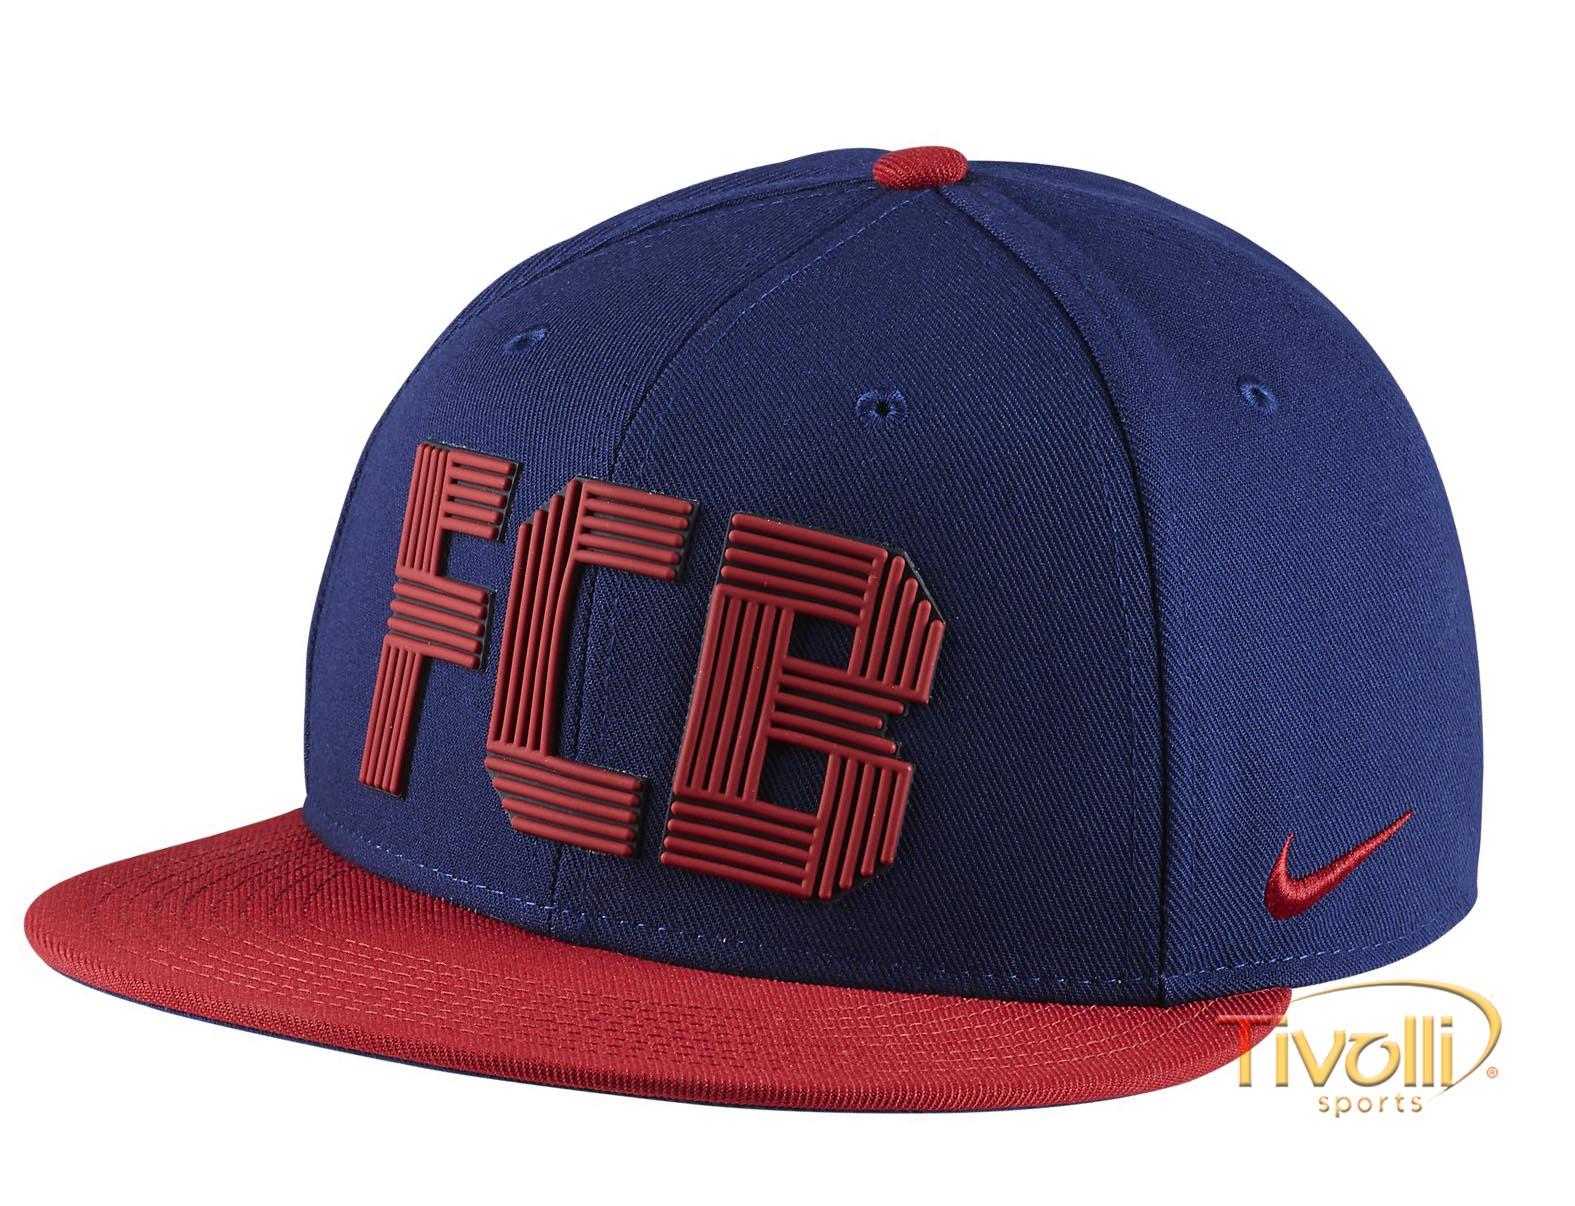 Jarra Horno petróleo  Boné Nike Barcelona Adjustable Hat FCB > >